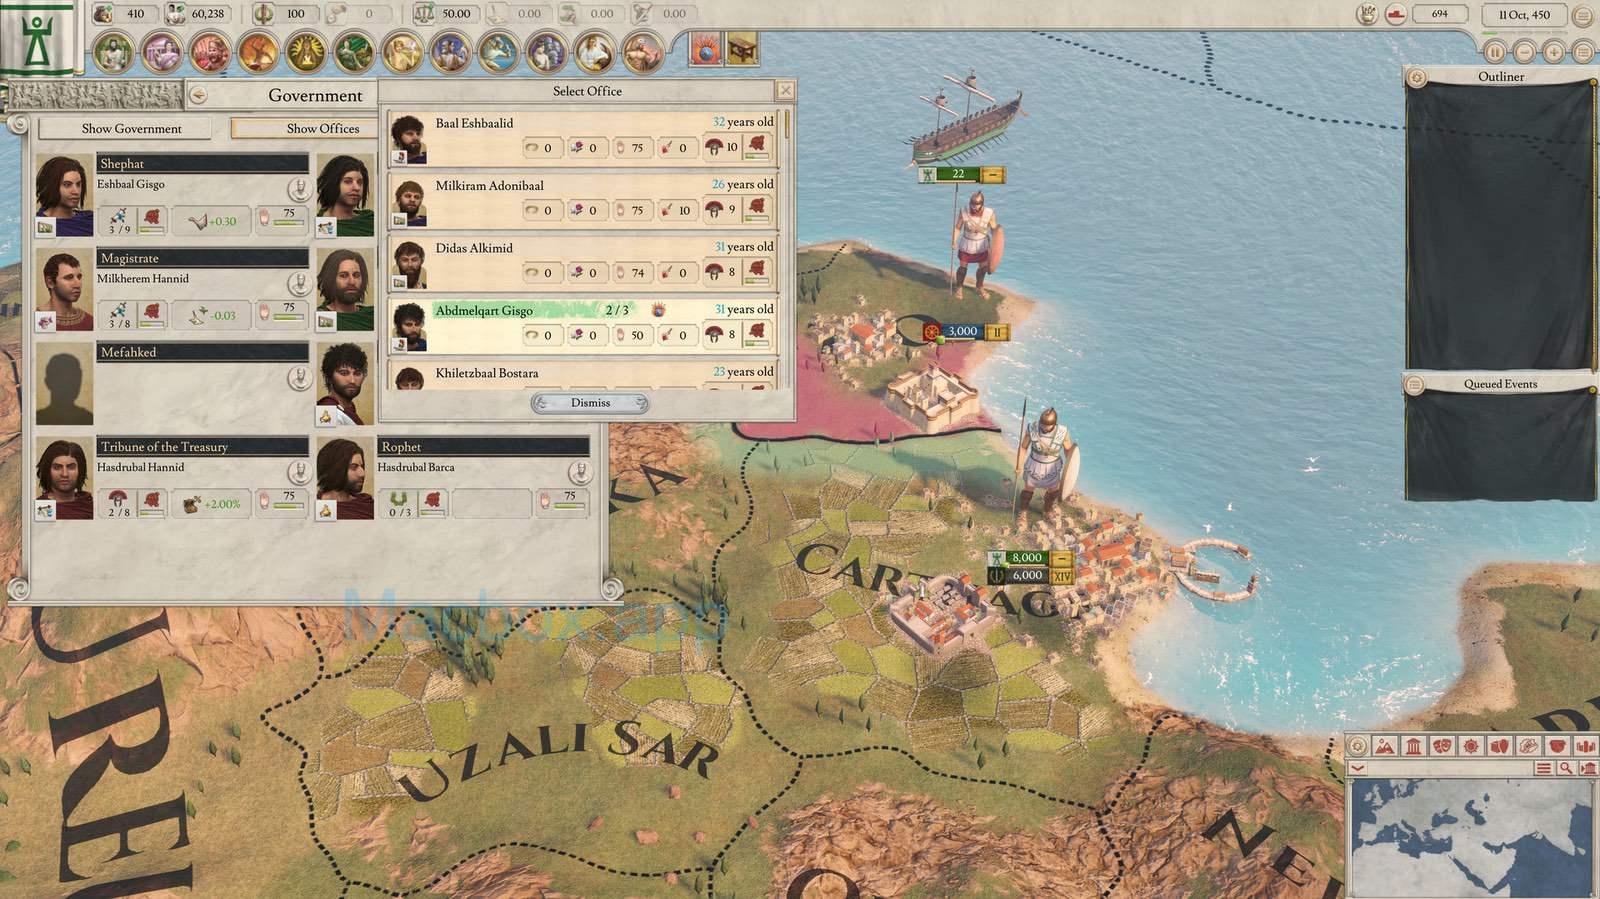 《Imperator: Rome》 游戏界面